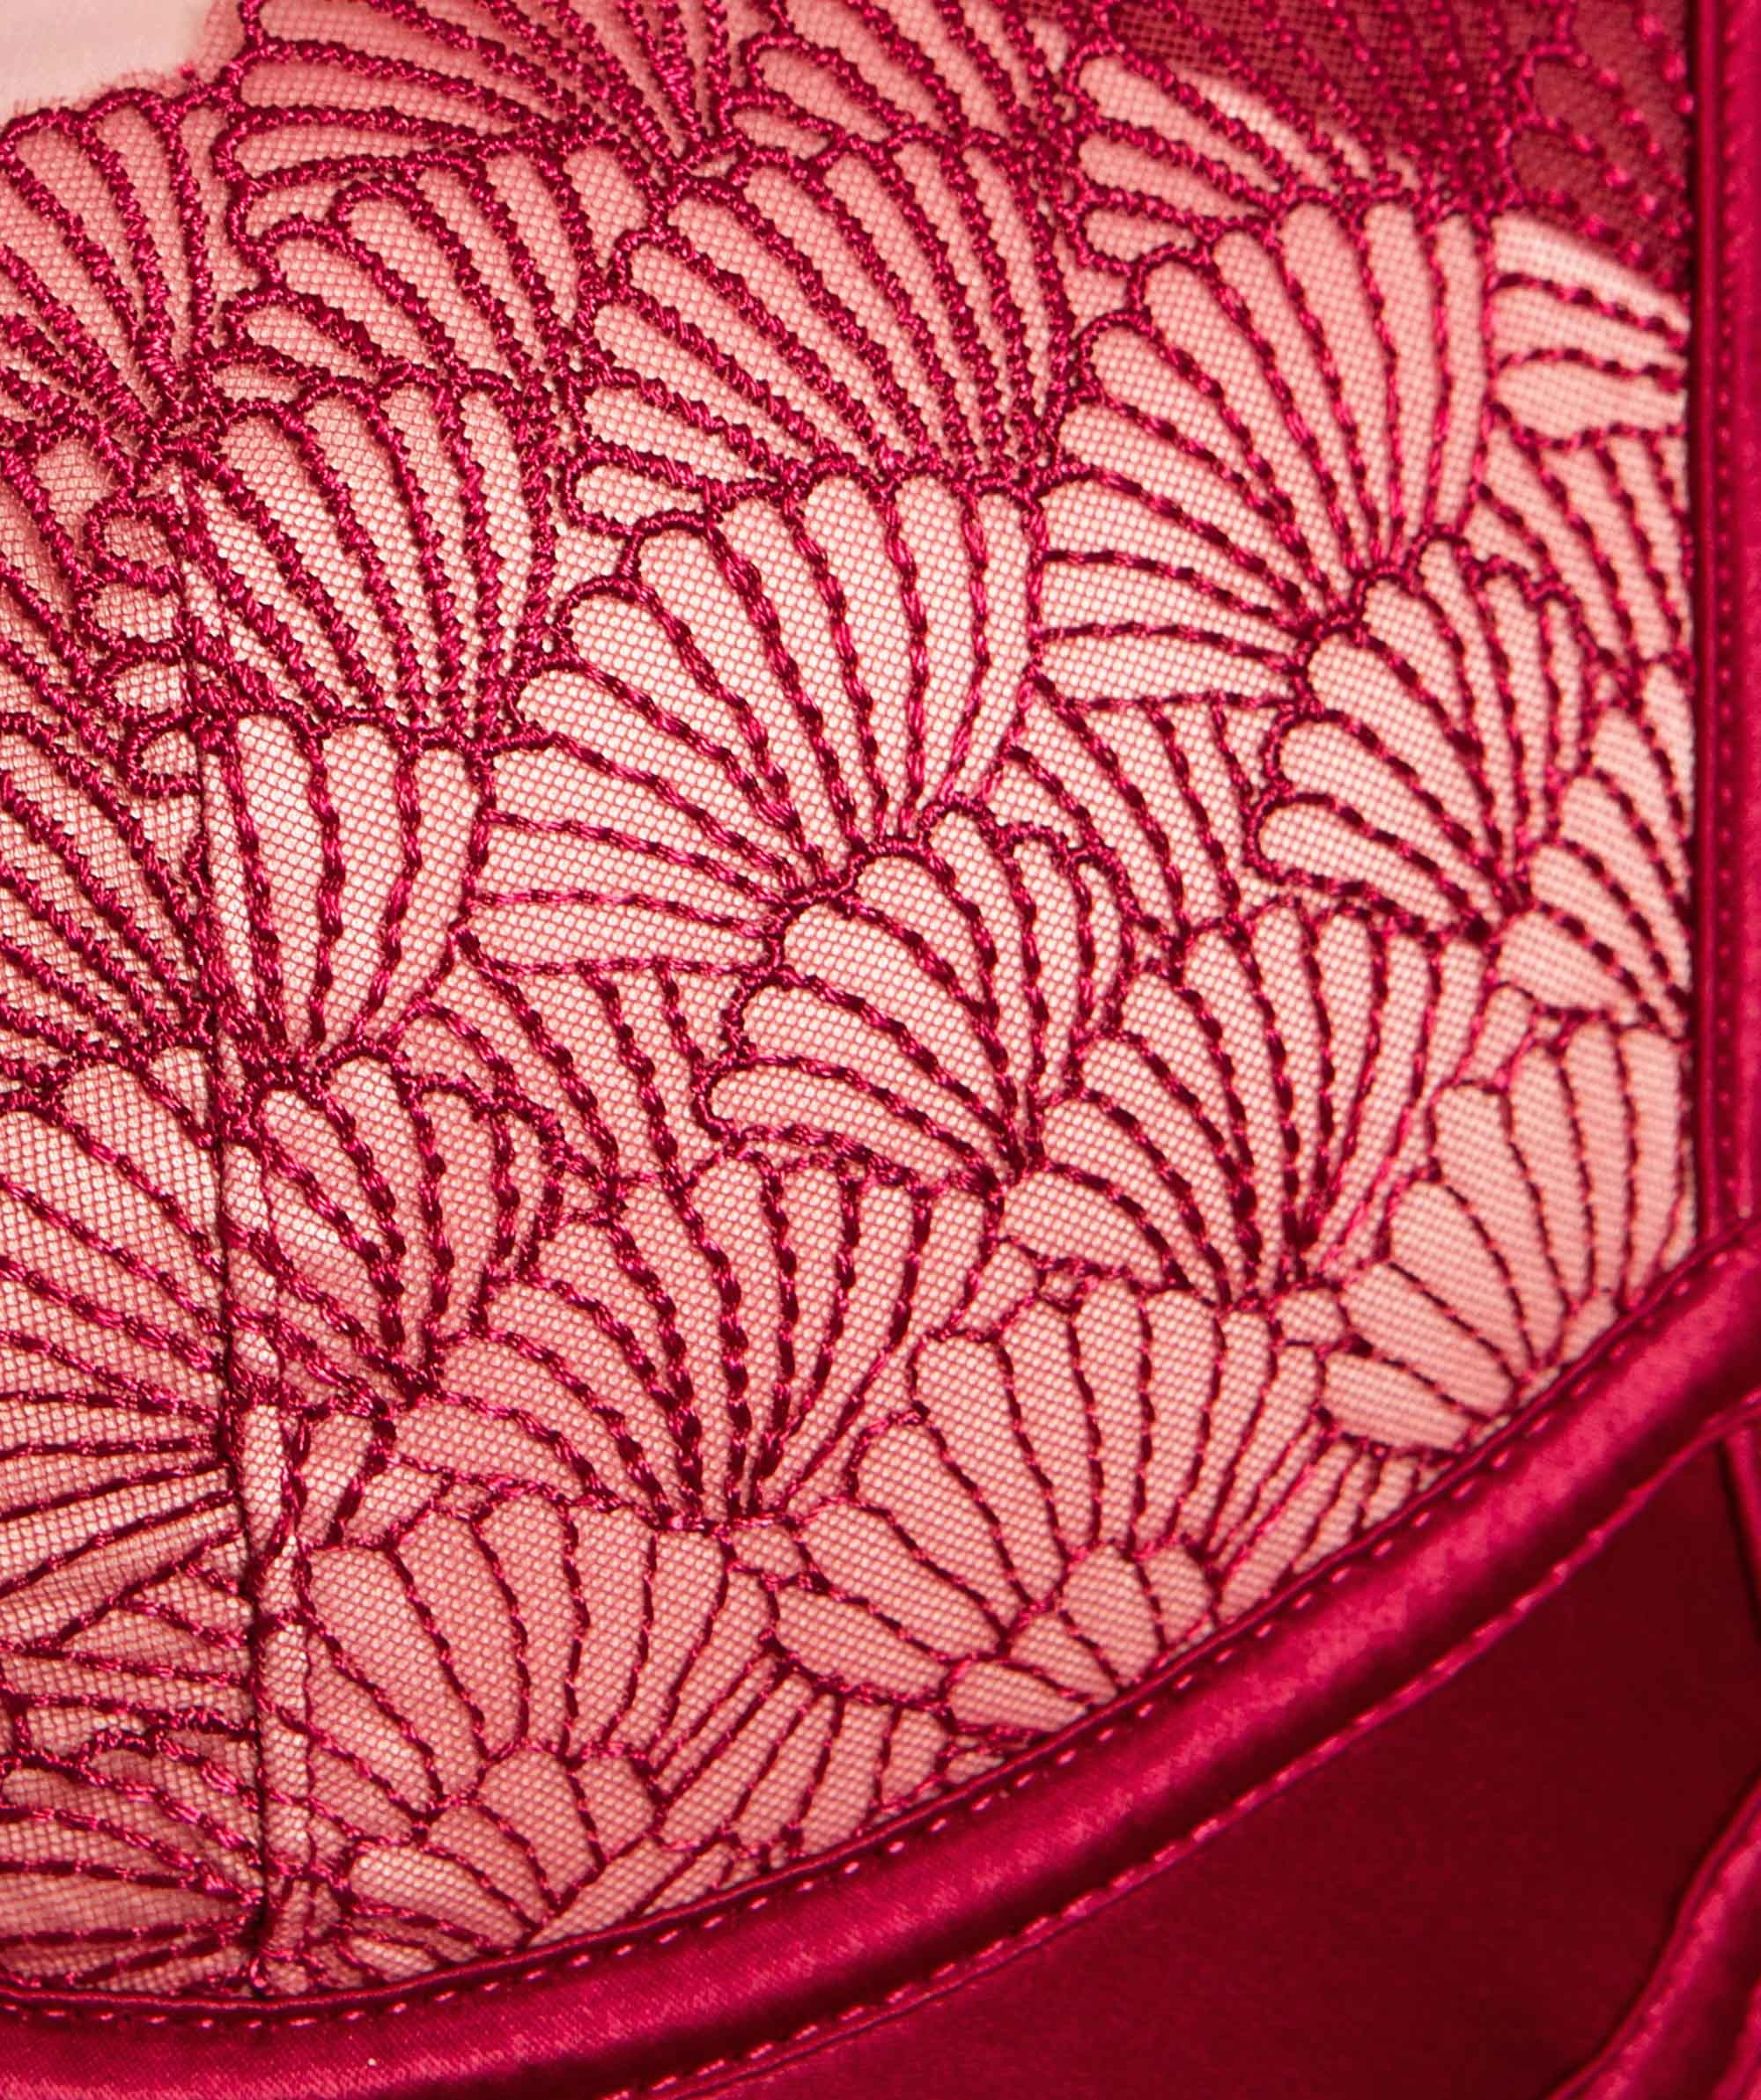 Enchanted Delta Push Up Bra - Red/Light Pink